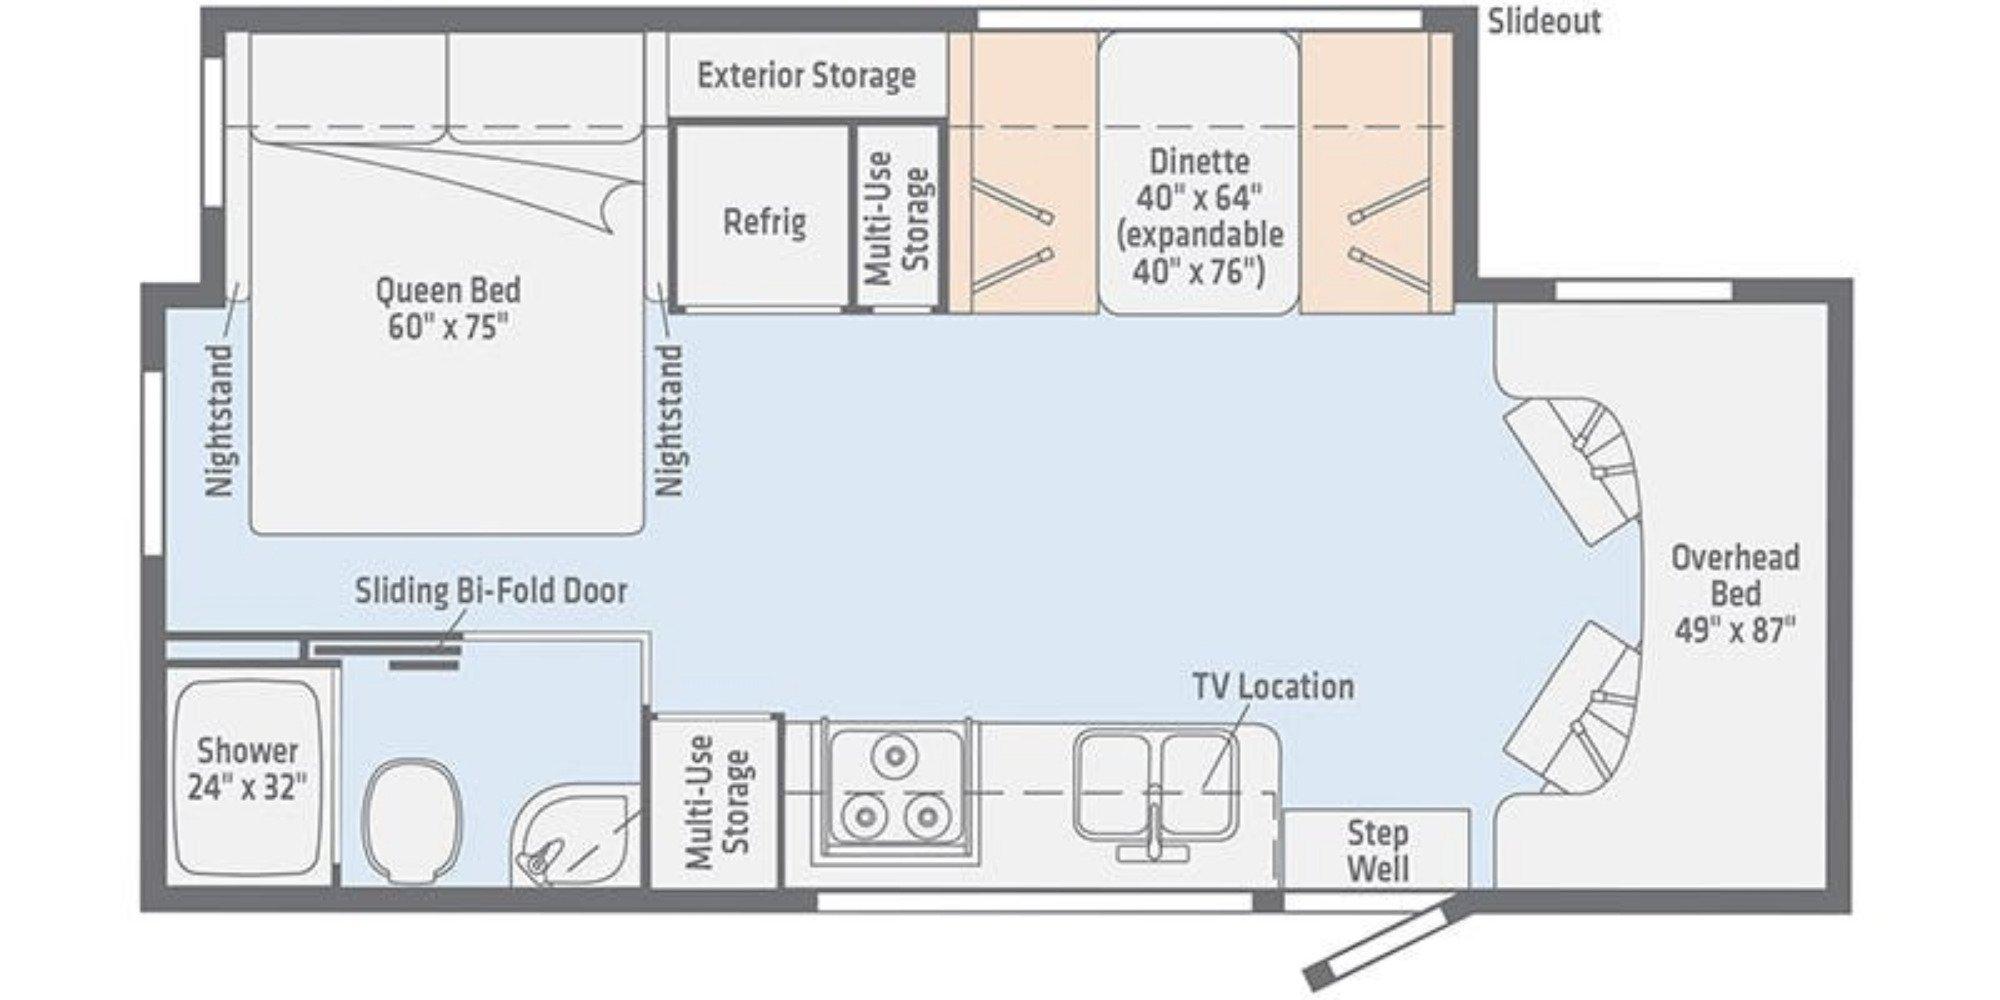 View Floor Plan for 2020 WINNEBAGO VITA 24P